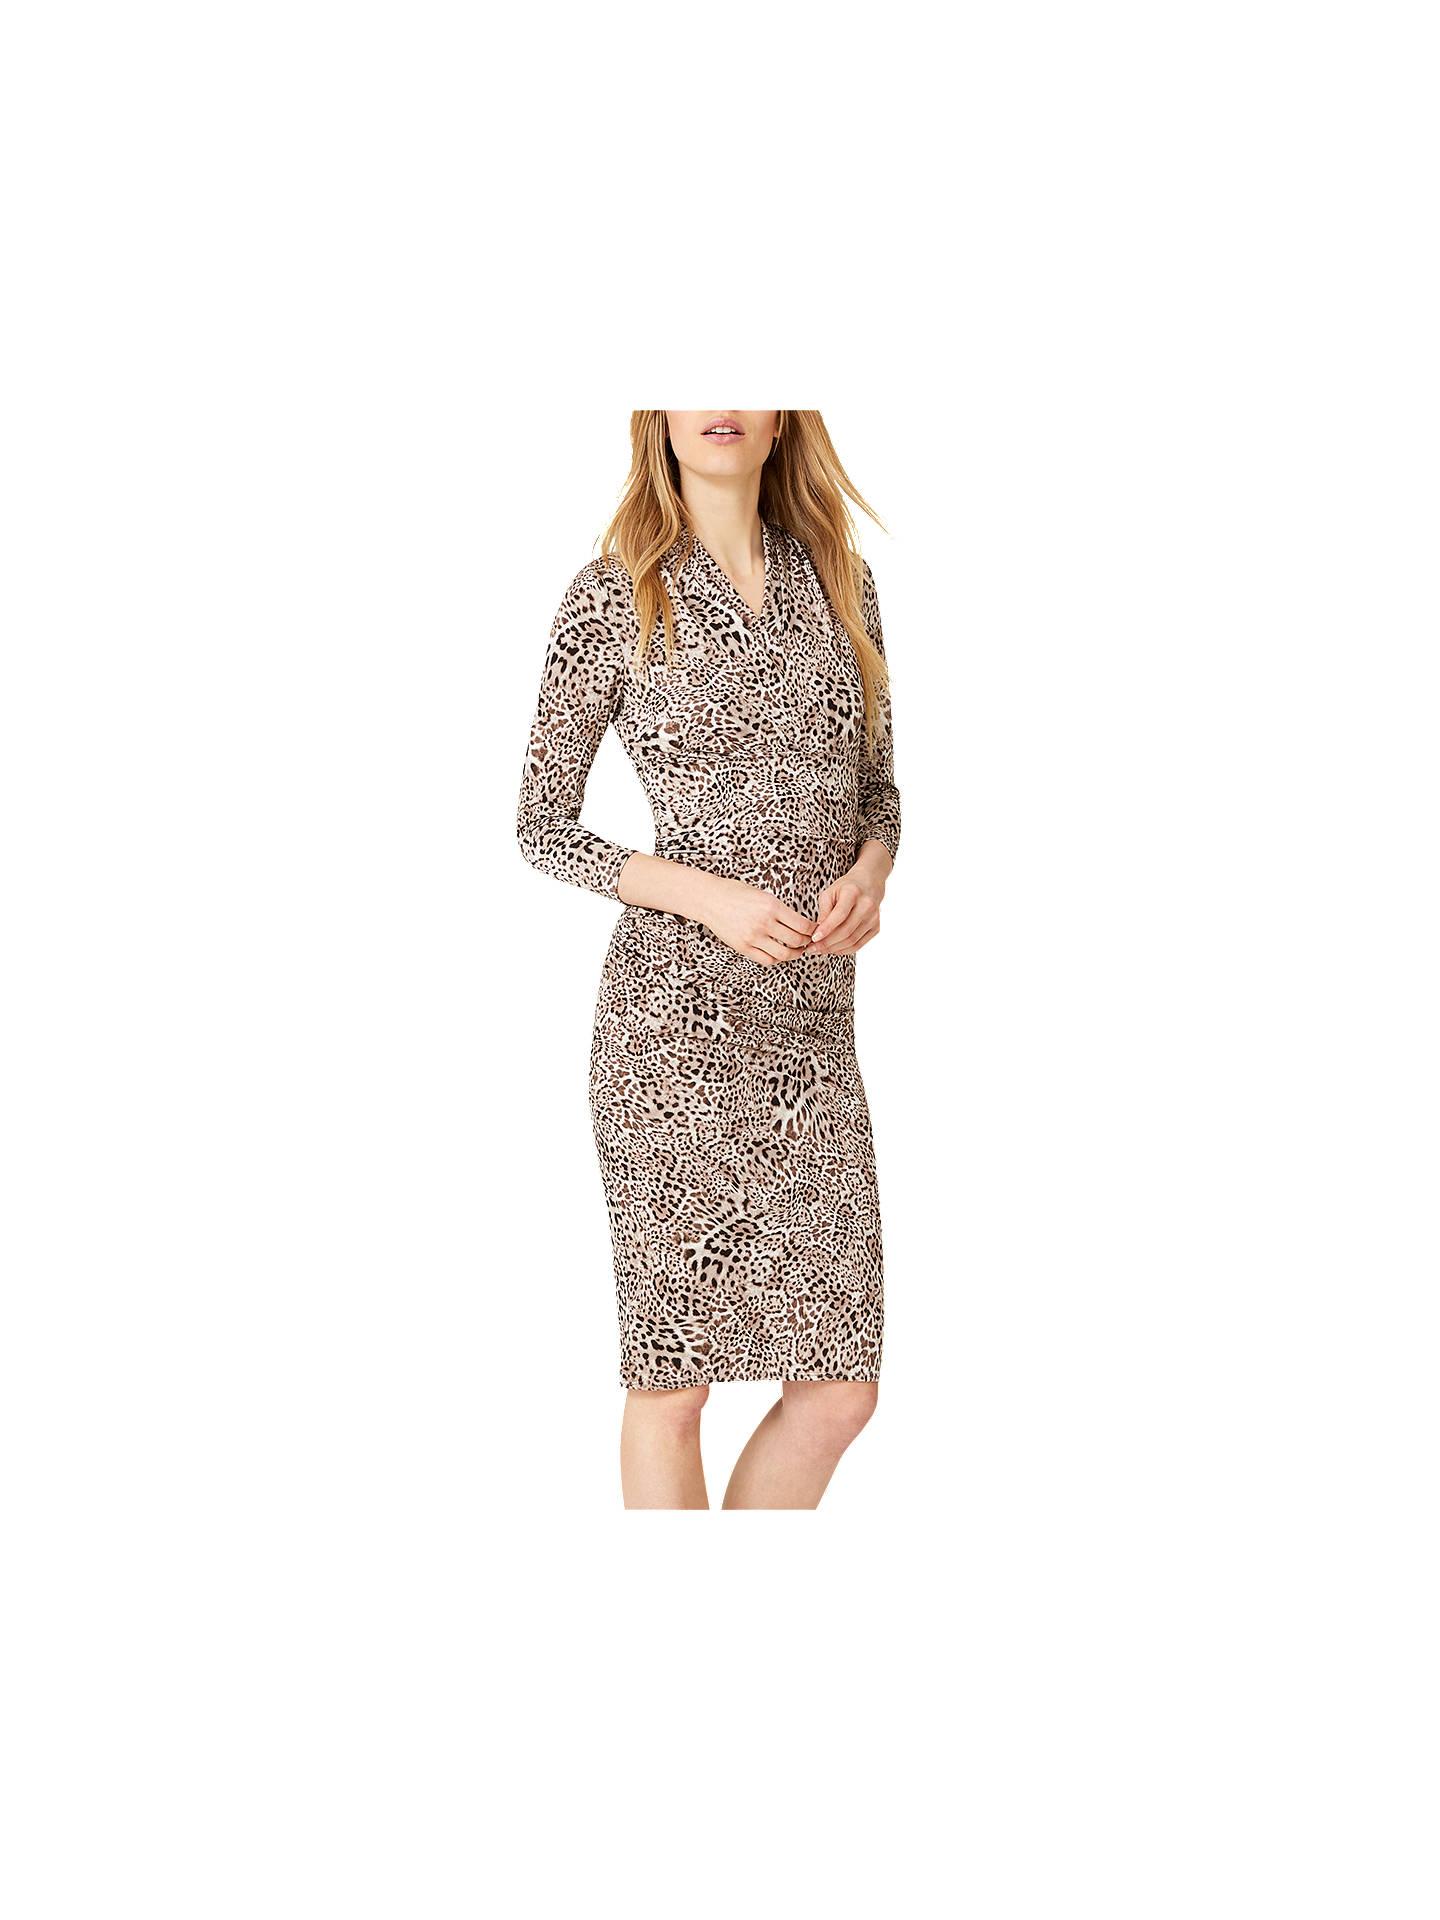 ccaeb89415 BuyDamsel in a Dress Kacey Leopard Print Dress